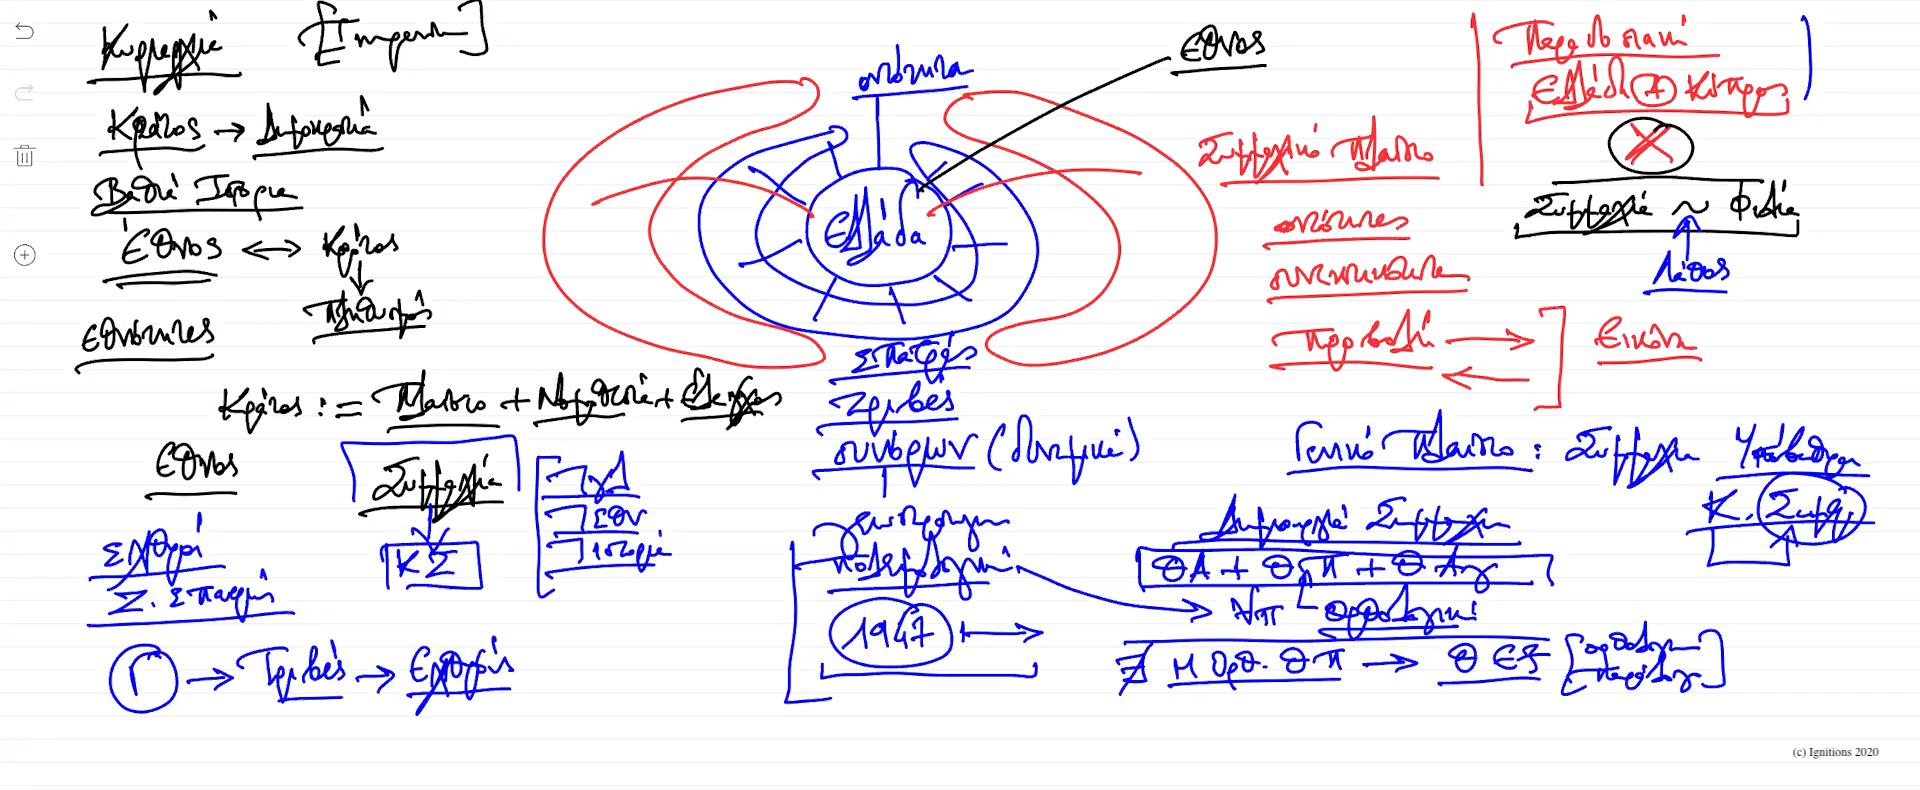 56018 - VIII - e-Διάλεξη: Ελληνική Γεωστρατηγική I. (Dessin)